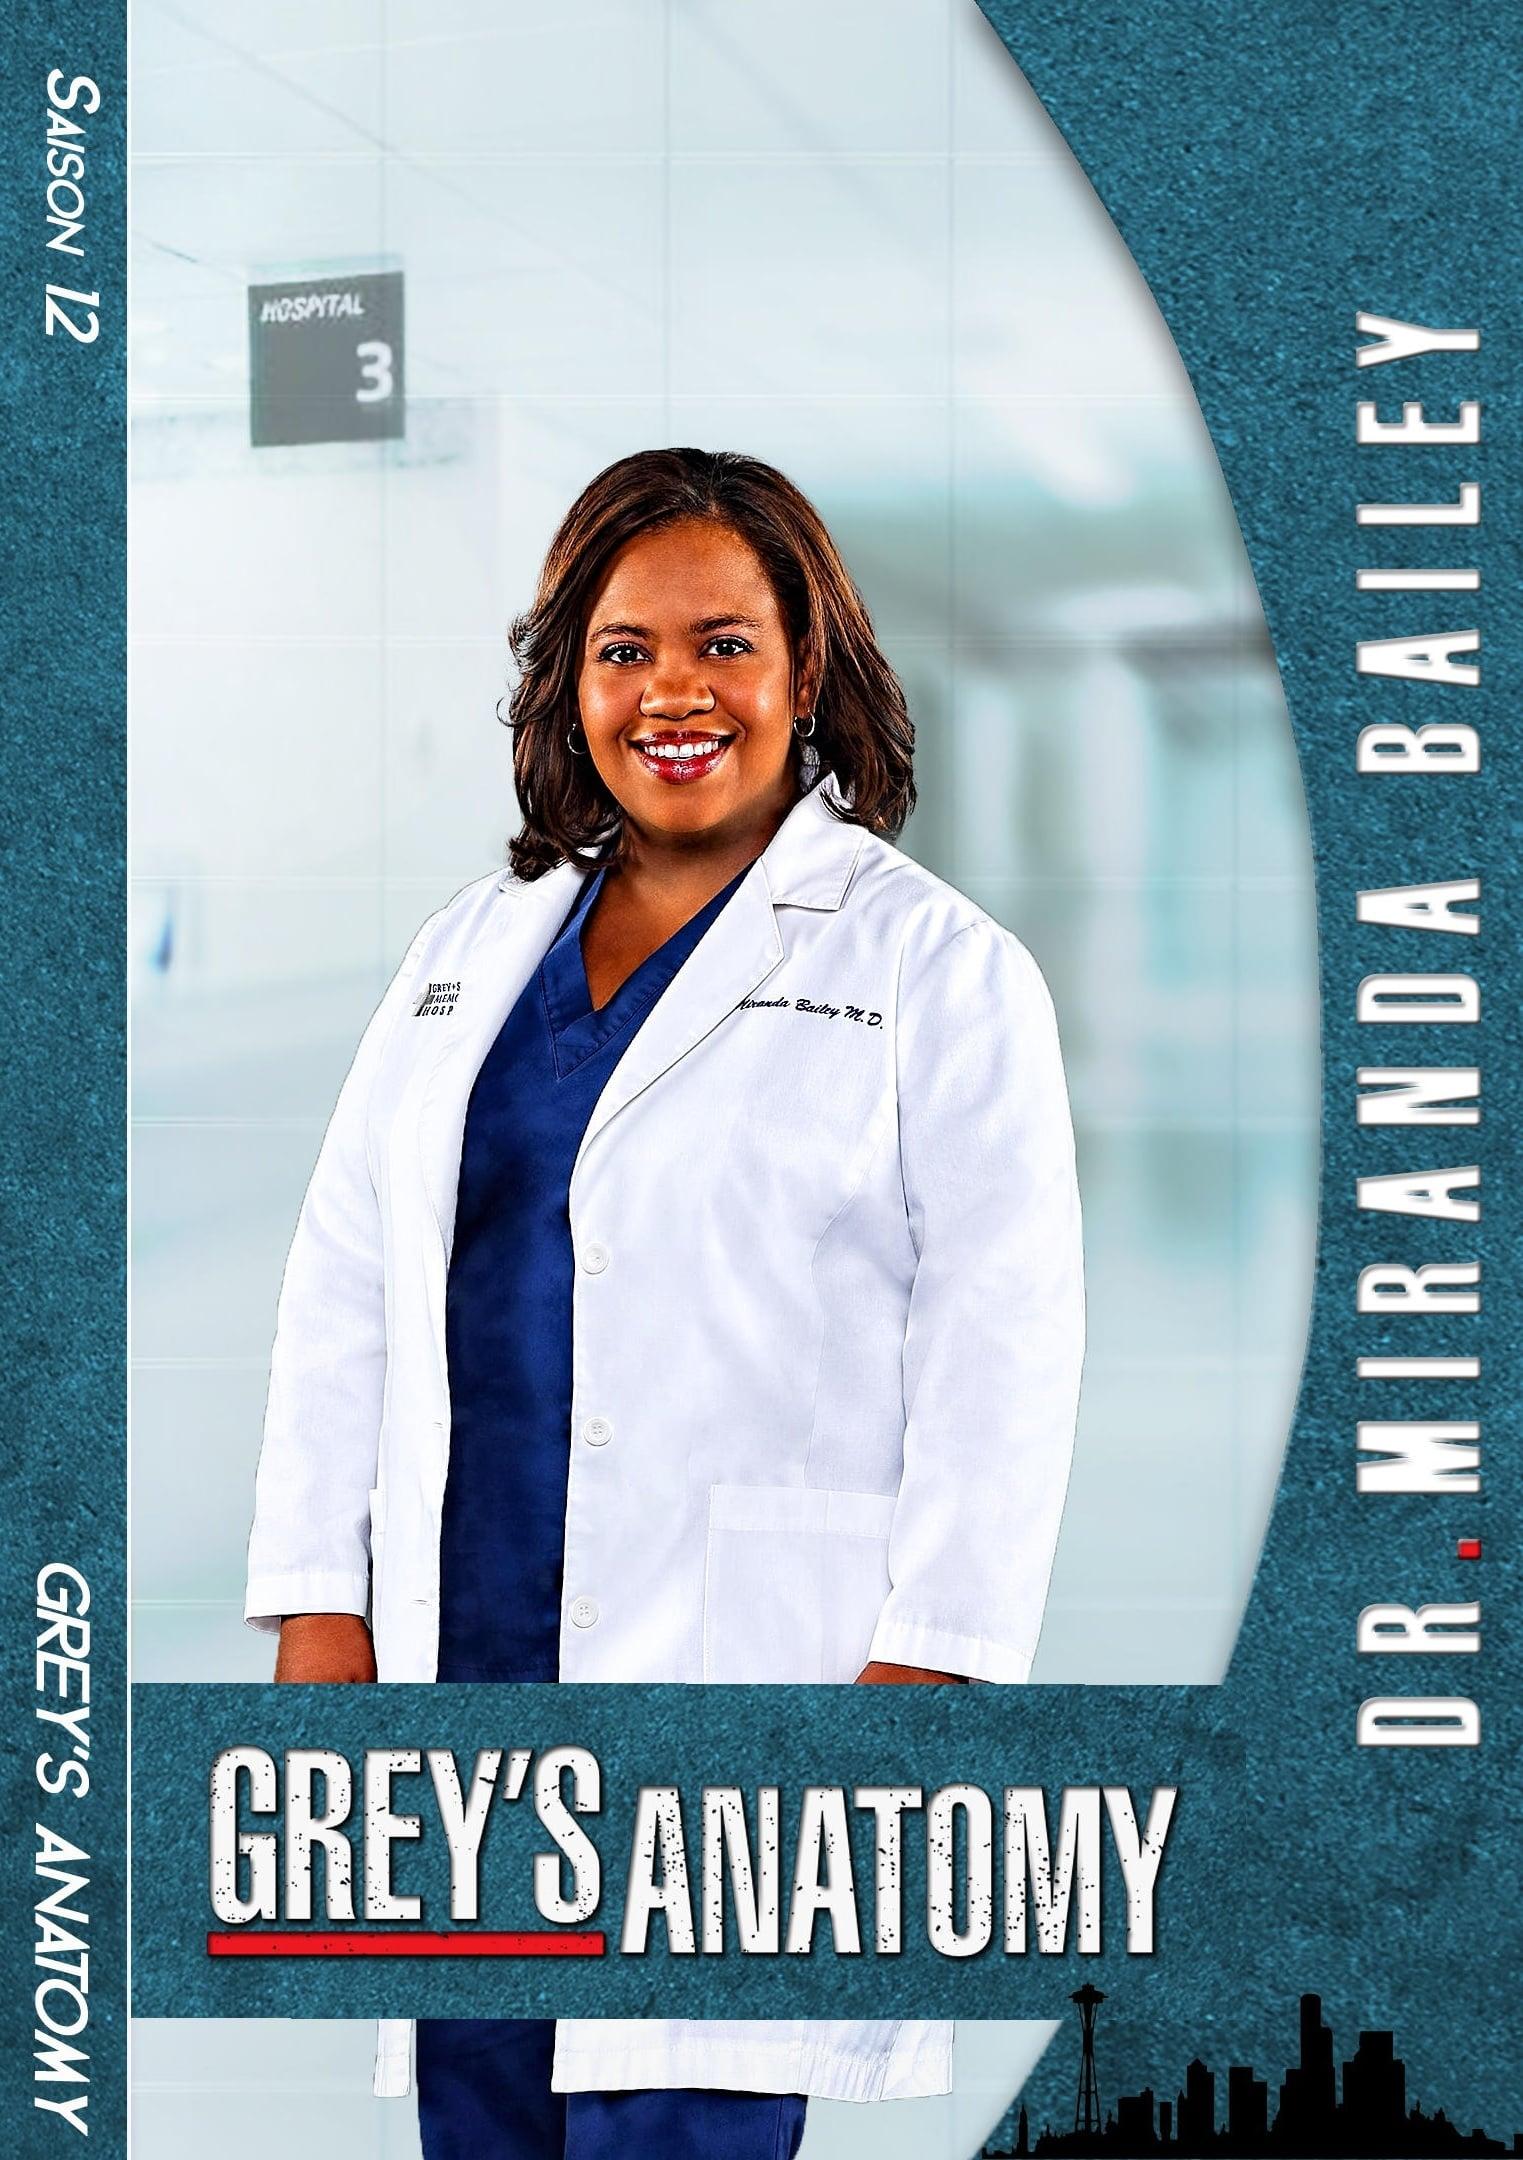 Grey's Anatomy 【2005】 saison 15 episode 12 en streaming VF...